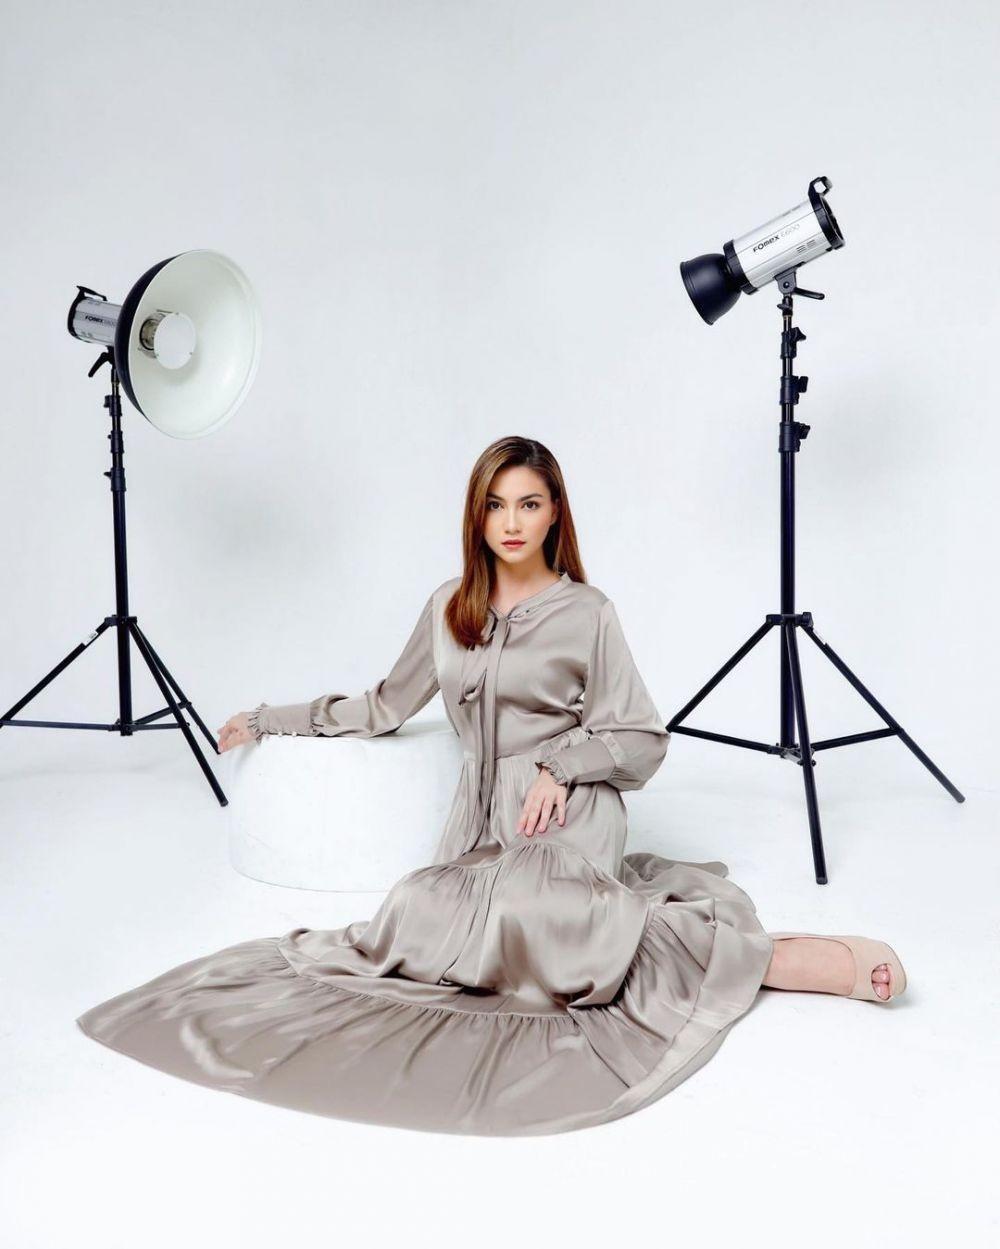 9 Inspirasi OOTD ala Alessia Cestaro, Fashionable Maksimal!